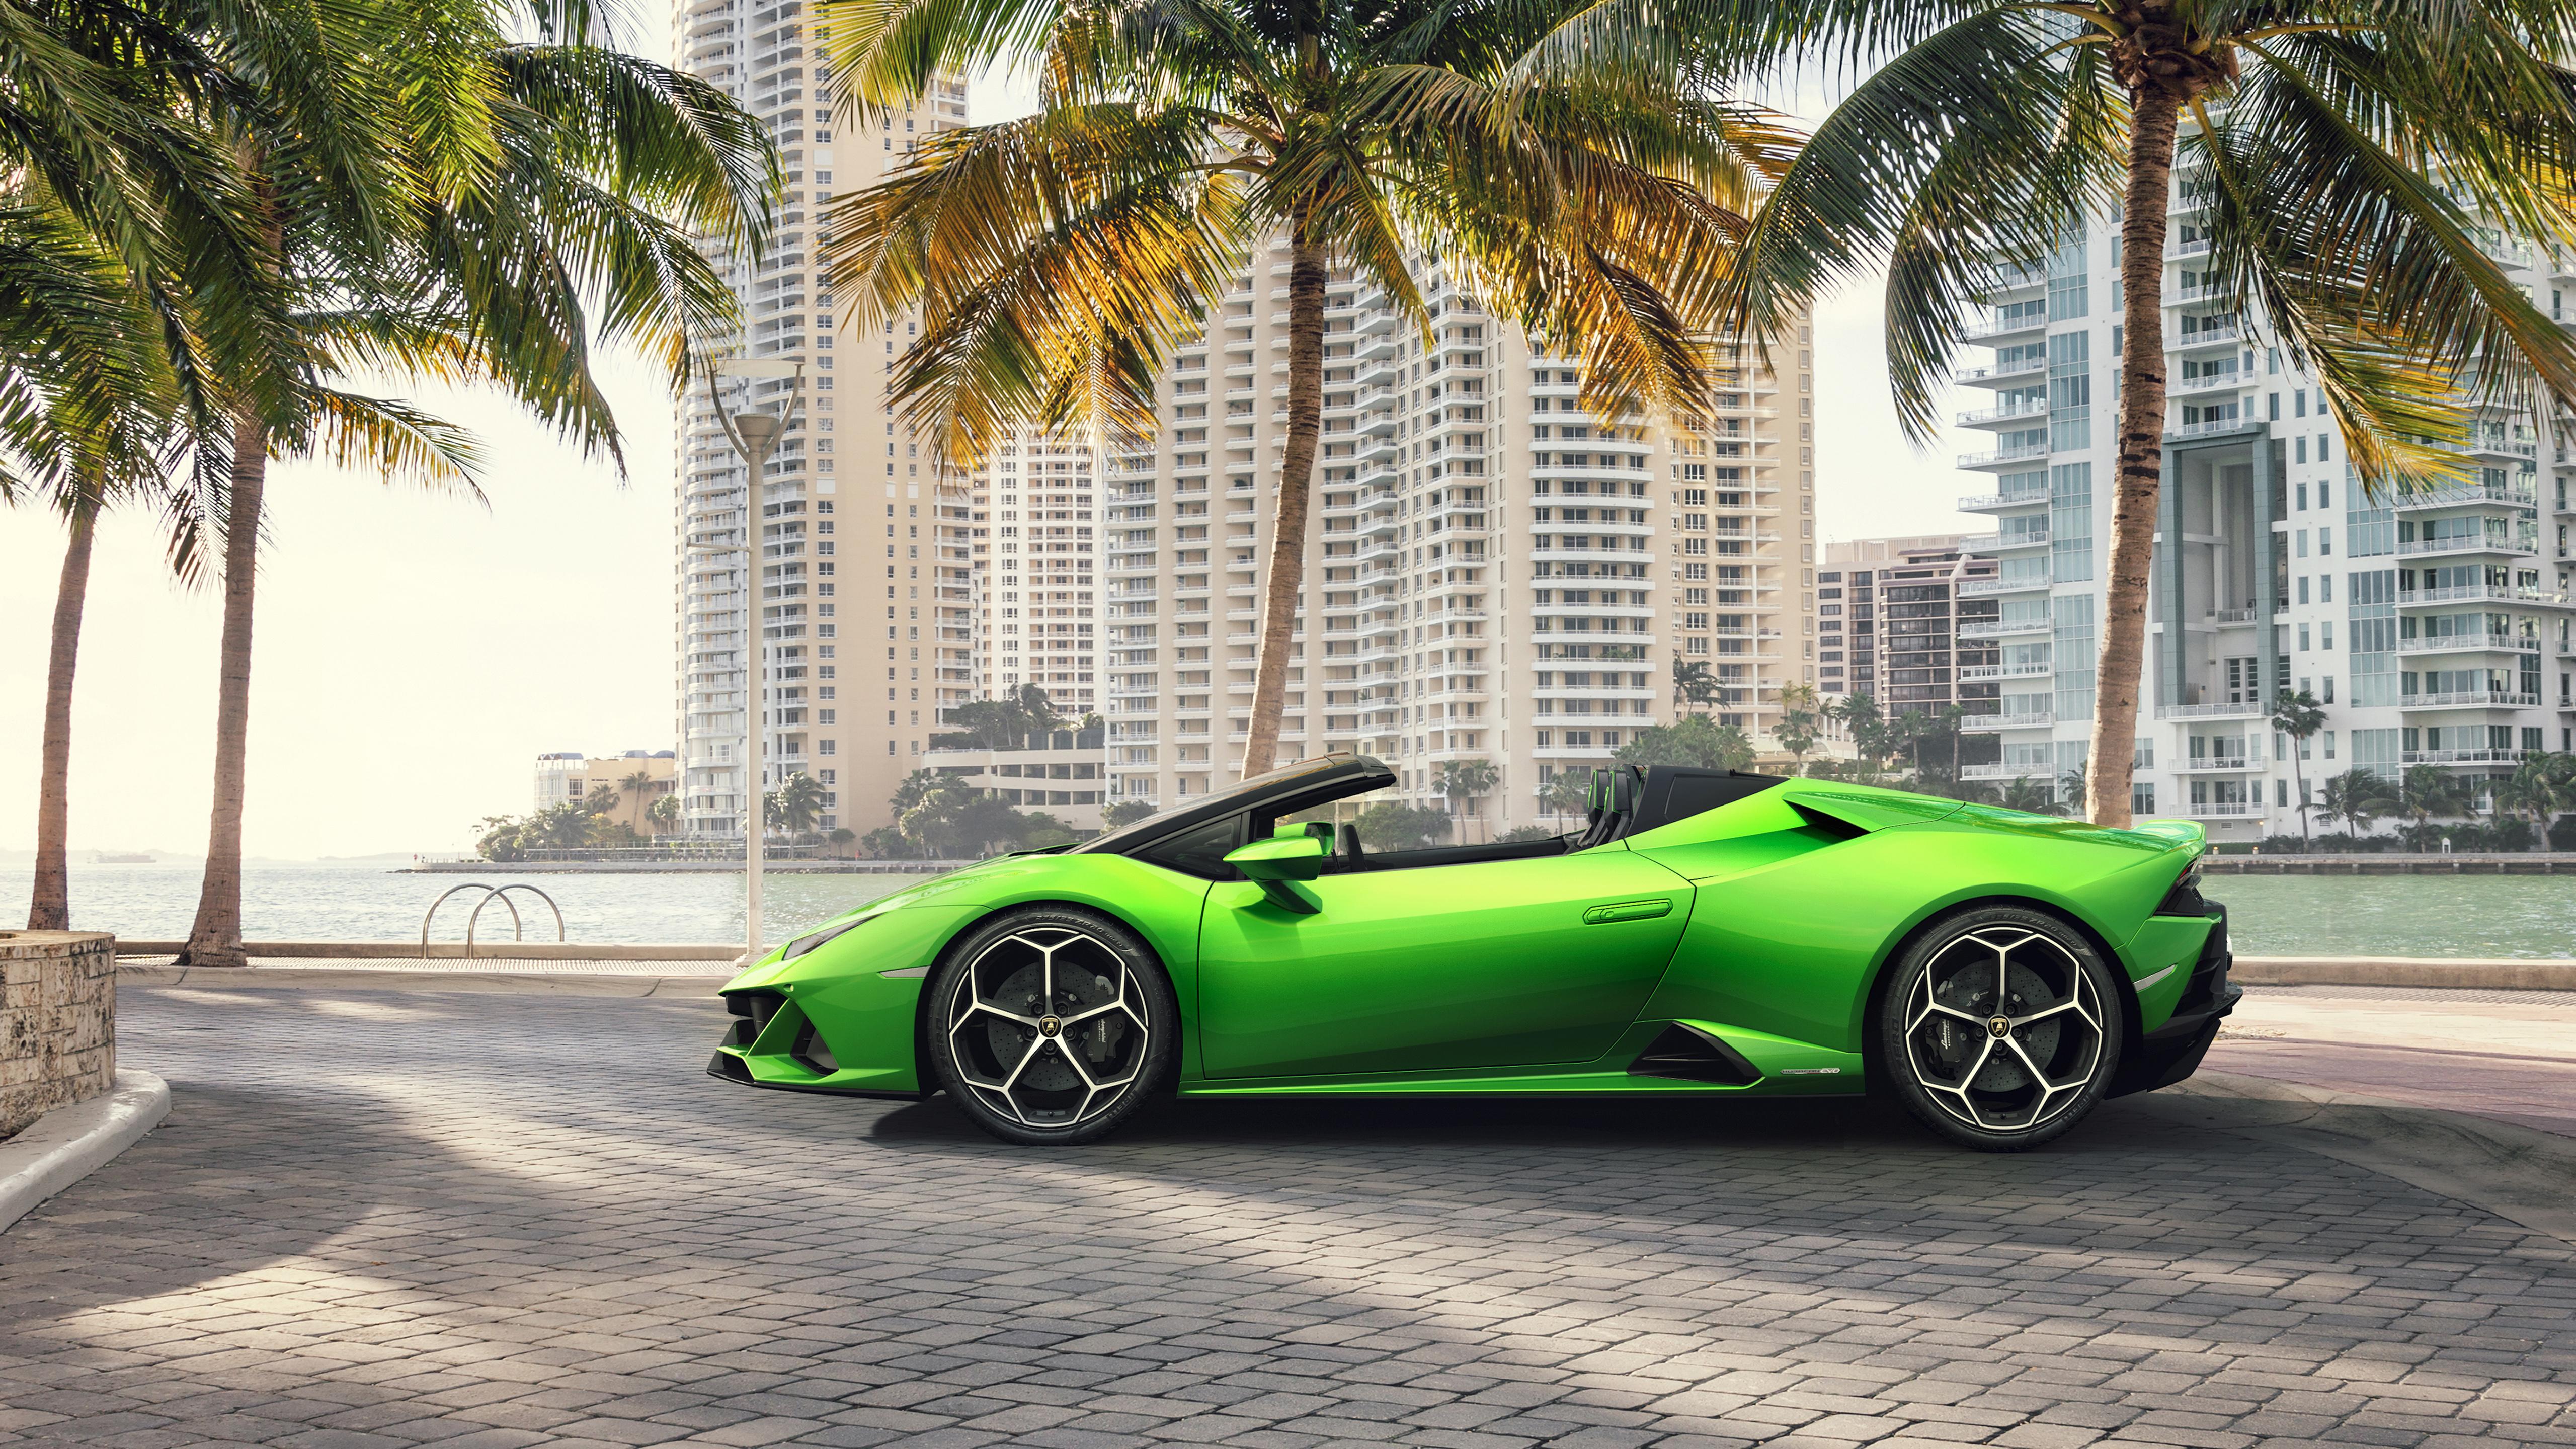 Lamborghini Huracan EVO Spyder 2019 5K 2 Wallpaper